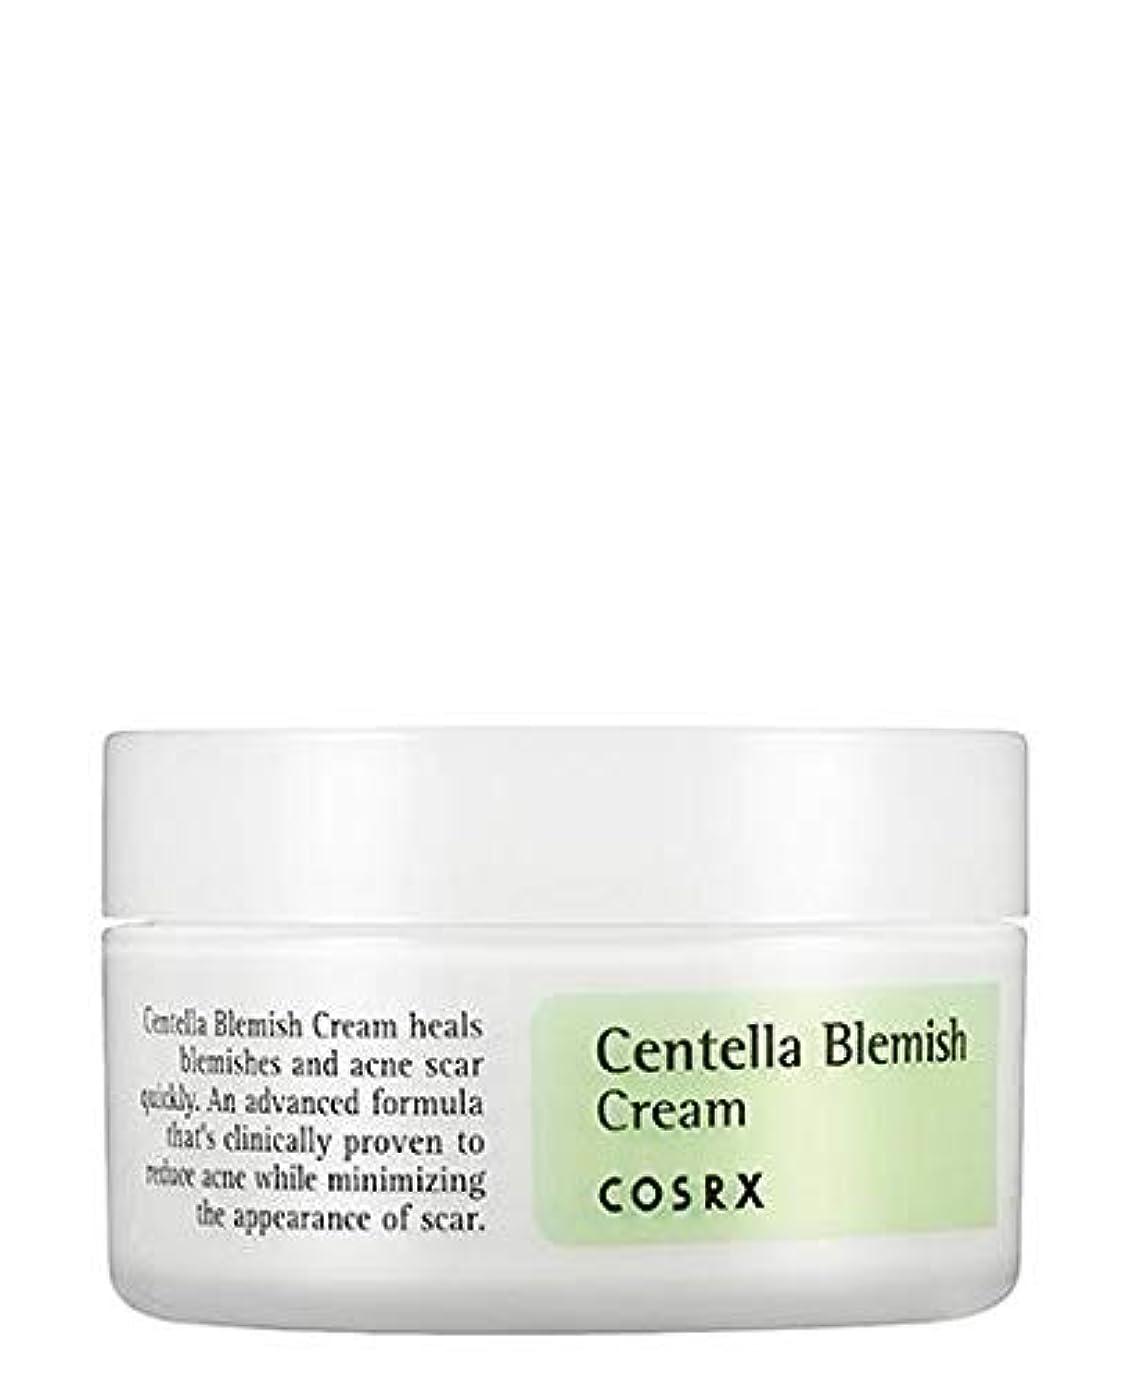 競争消化器闘争COSRX Centella Blemish Cream (並行輸入品)